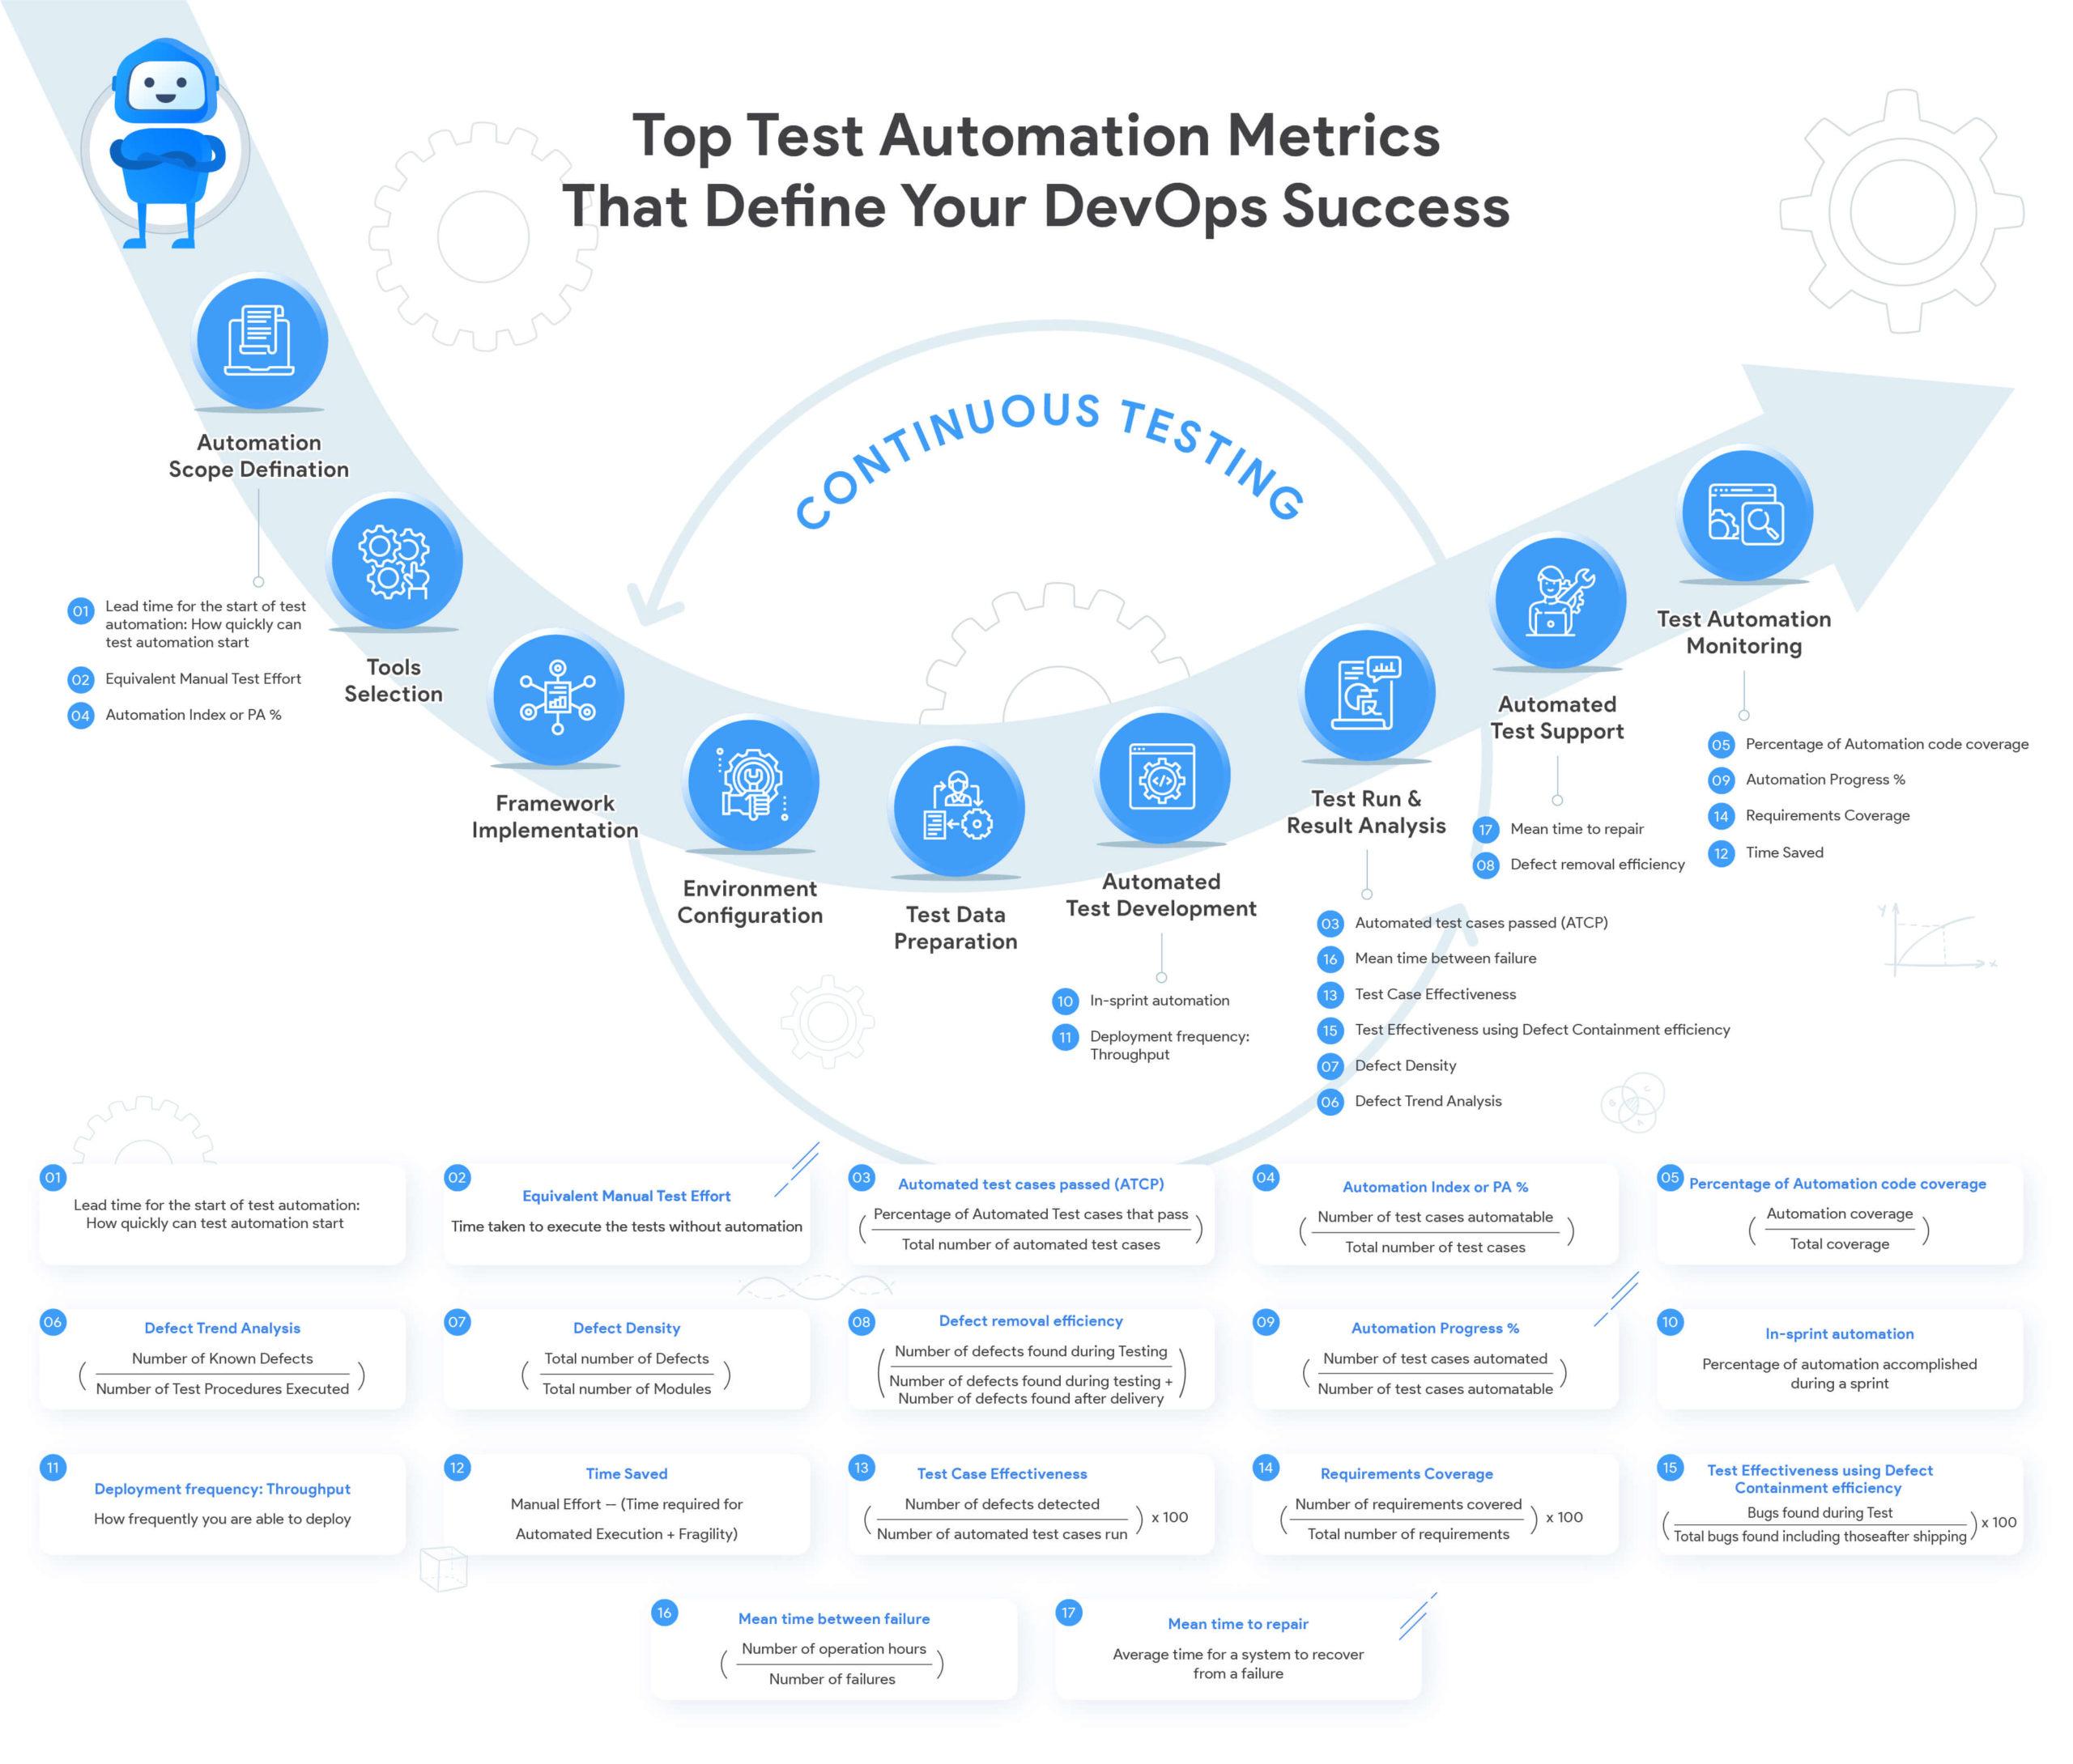 Image Test Automation Metrics